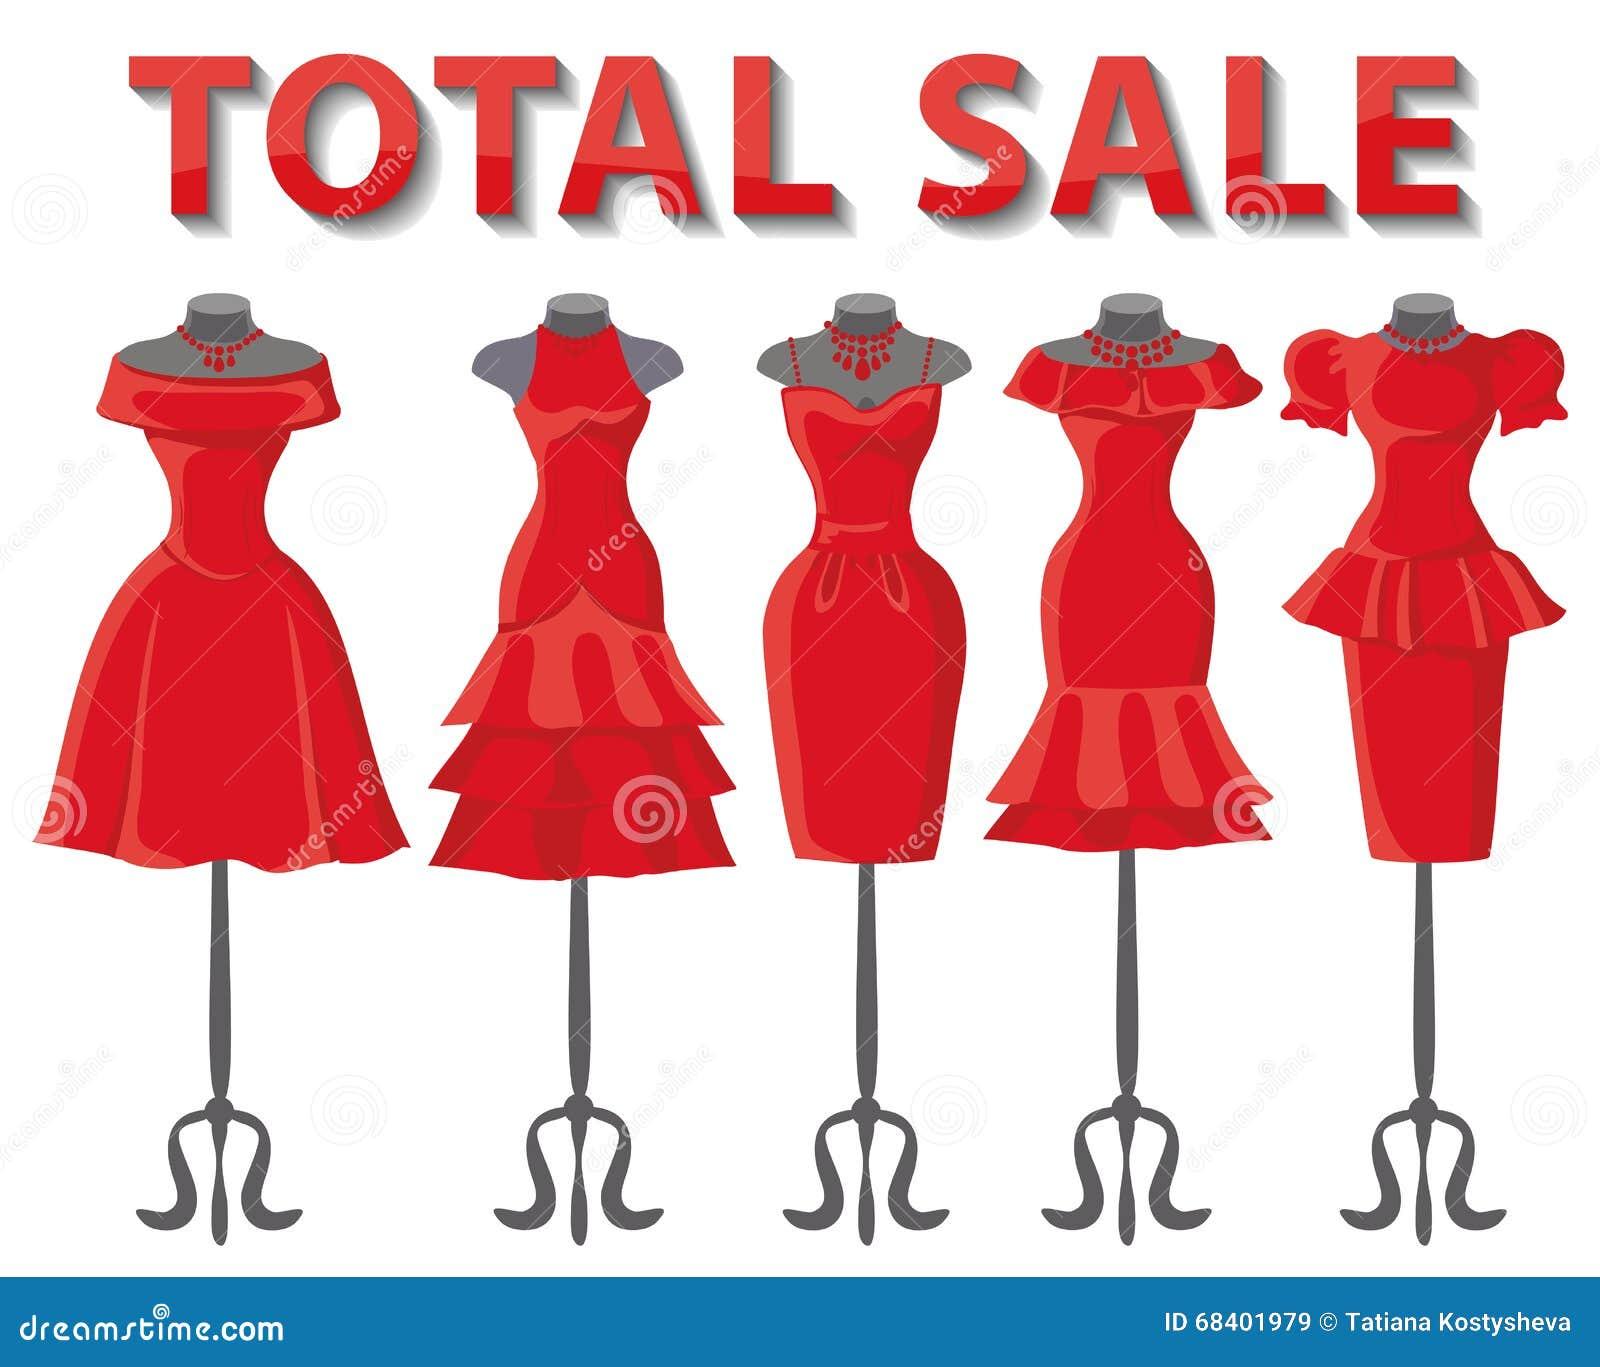 85737ea2d096 Φορέματα γυναικών στα μανεκέν καθορισμένα Κόμμα θερινής μόδας Σύντομη  συλλογή γυναικείων φορεμάτων σχεδίου κόκκινου χρώματος φουστών κομψή  διανυσματική ...